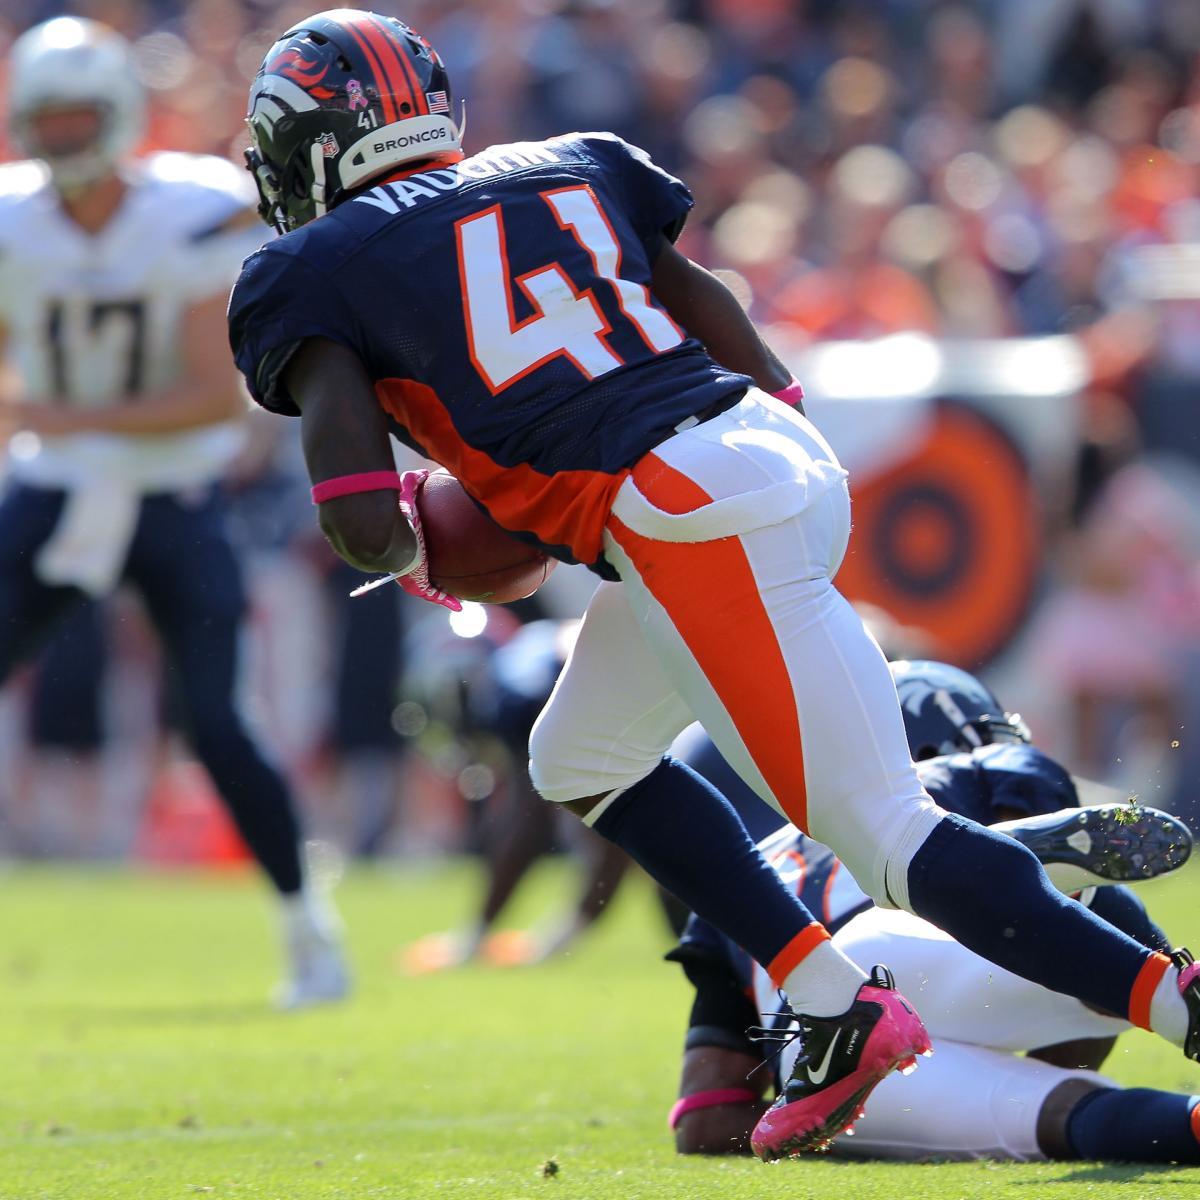 Breaking News: Denver Broncos Trade Cassius Vaughn To Indy